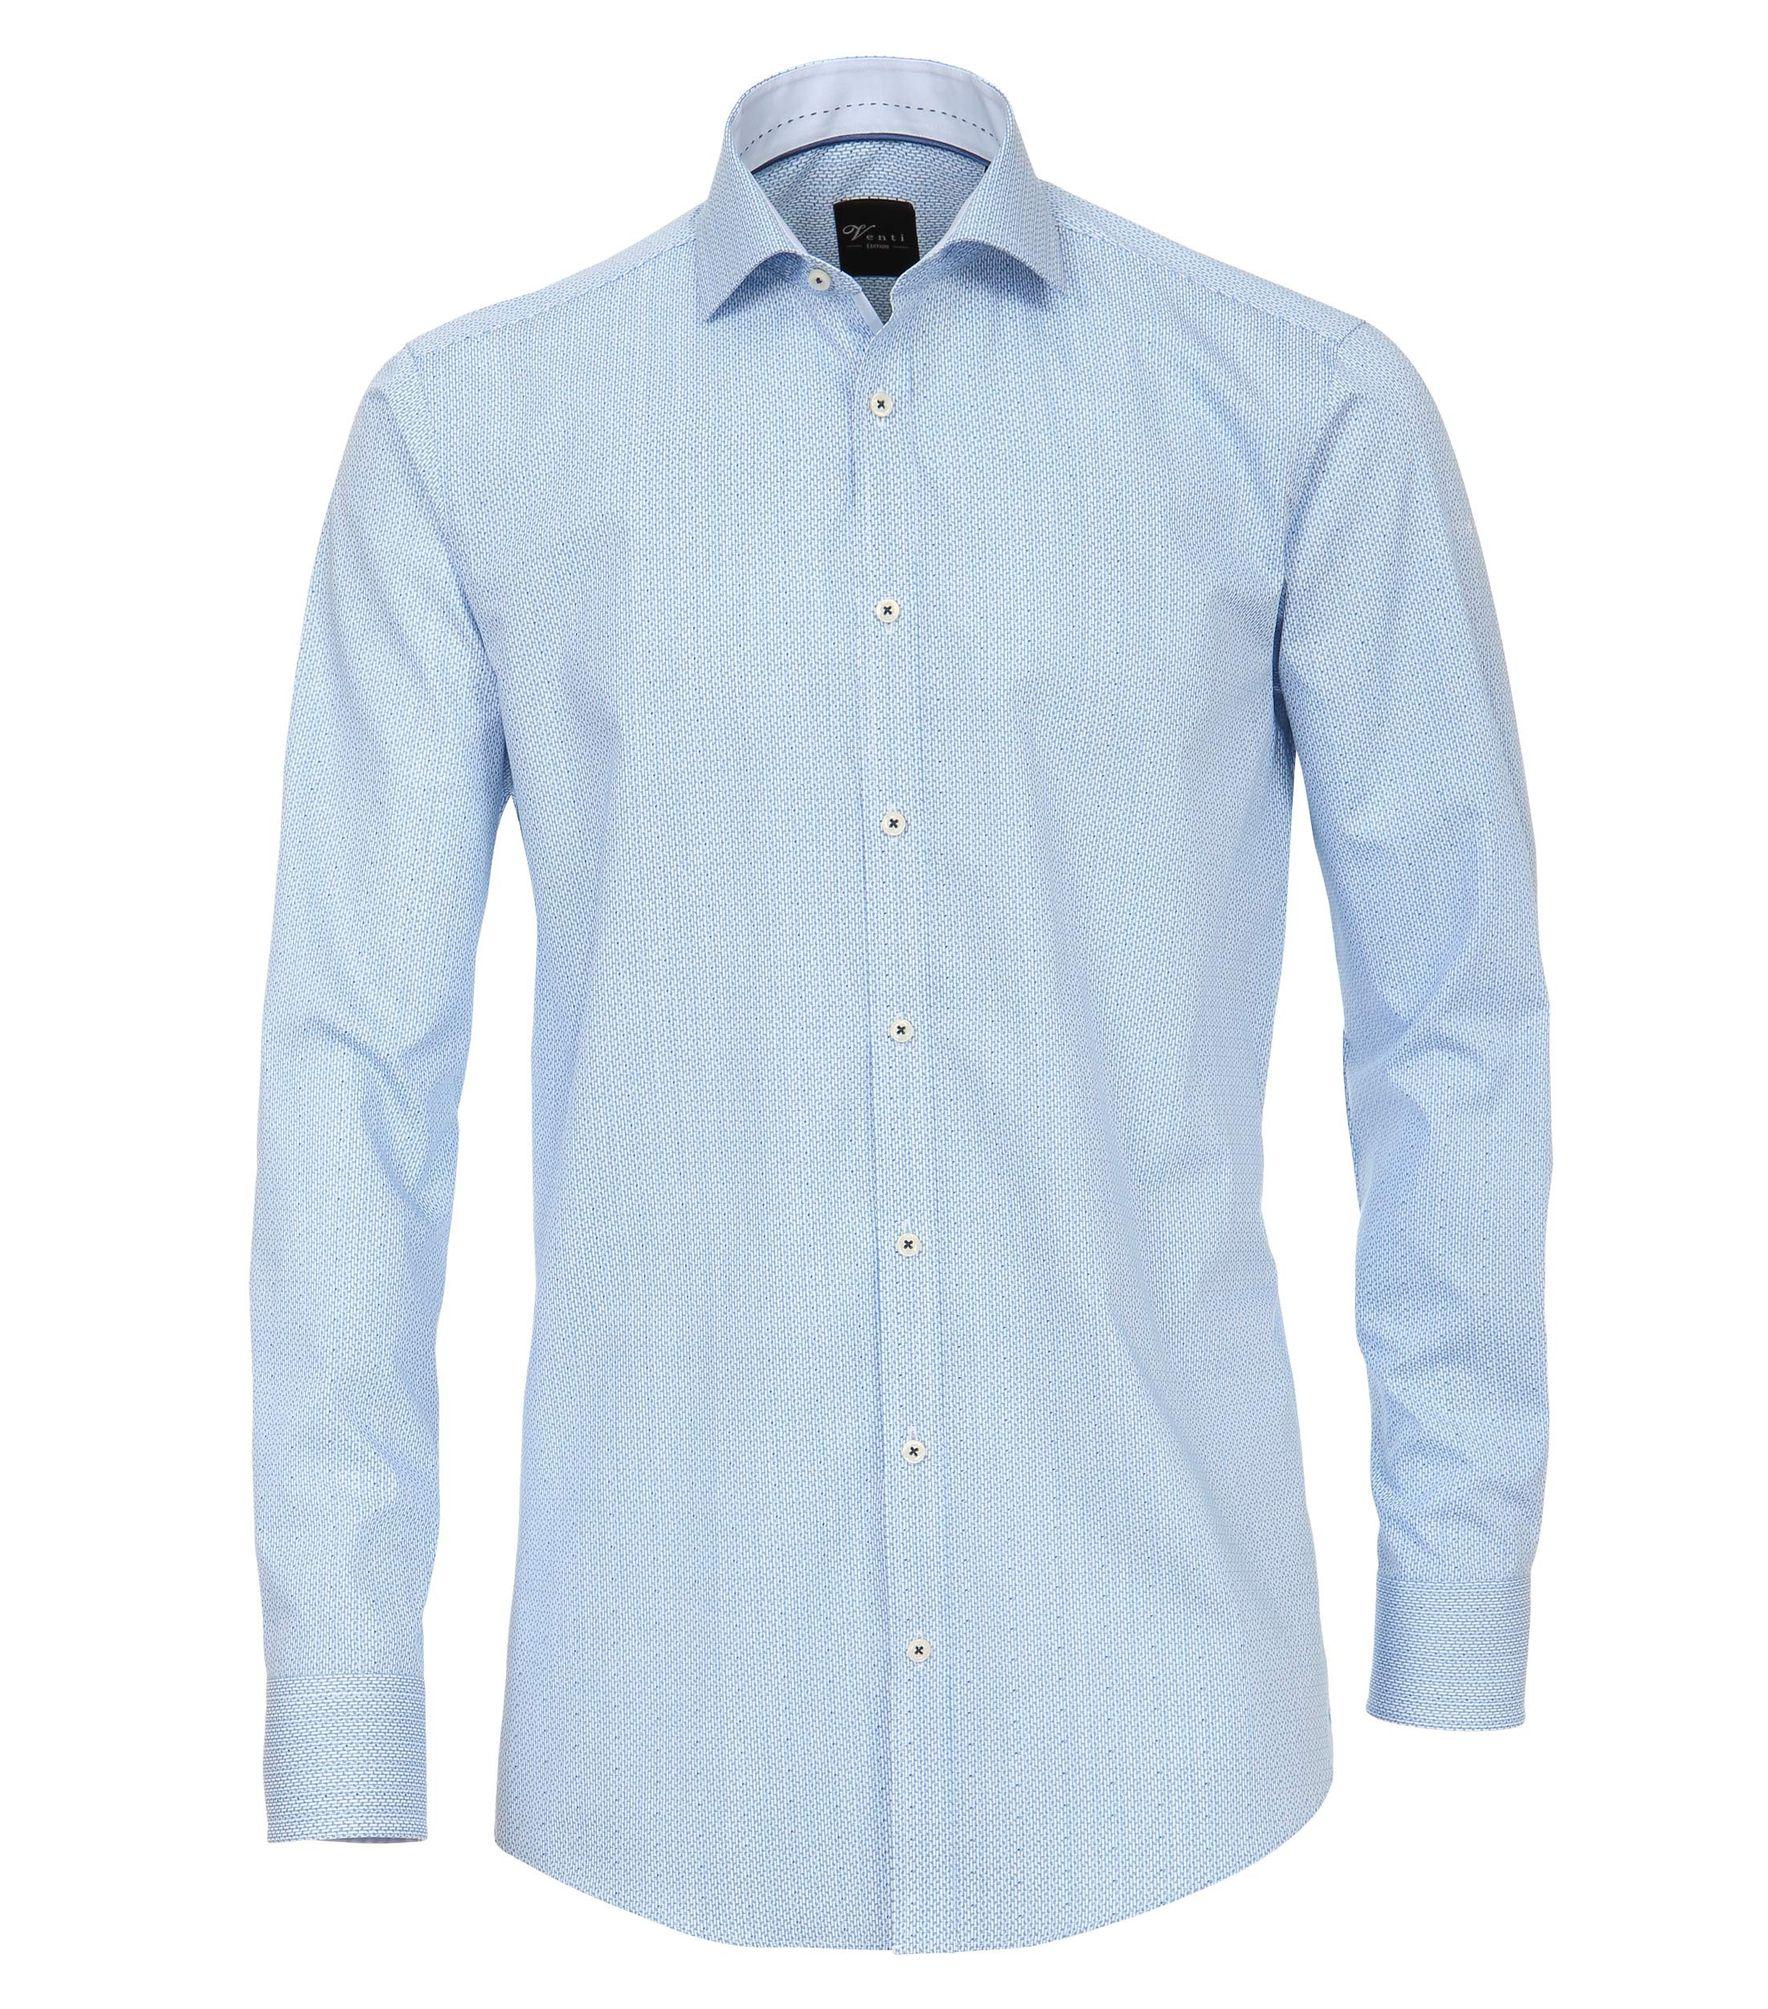 huge selection of ccf99 ad0f1 Venti - Slim Fit - Herren Hemd unifarben mit Button Down-Kragen in Blau  (182919800)